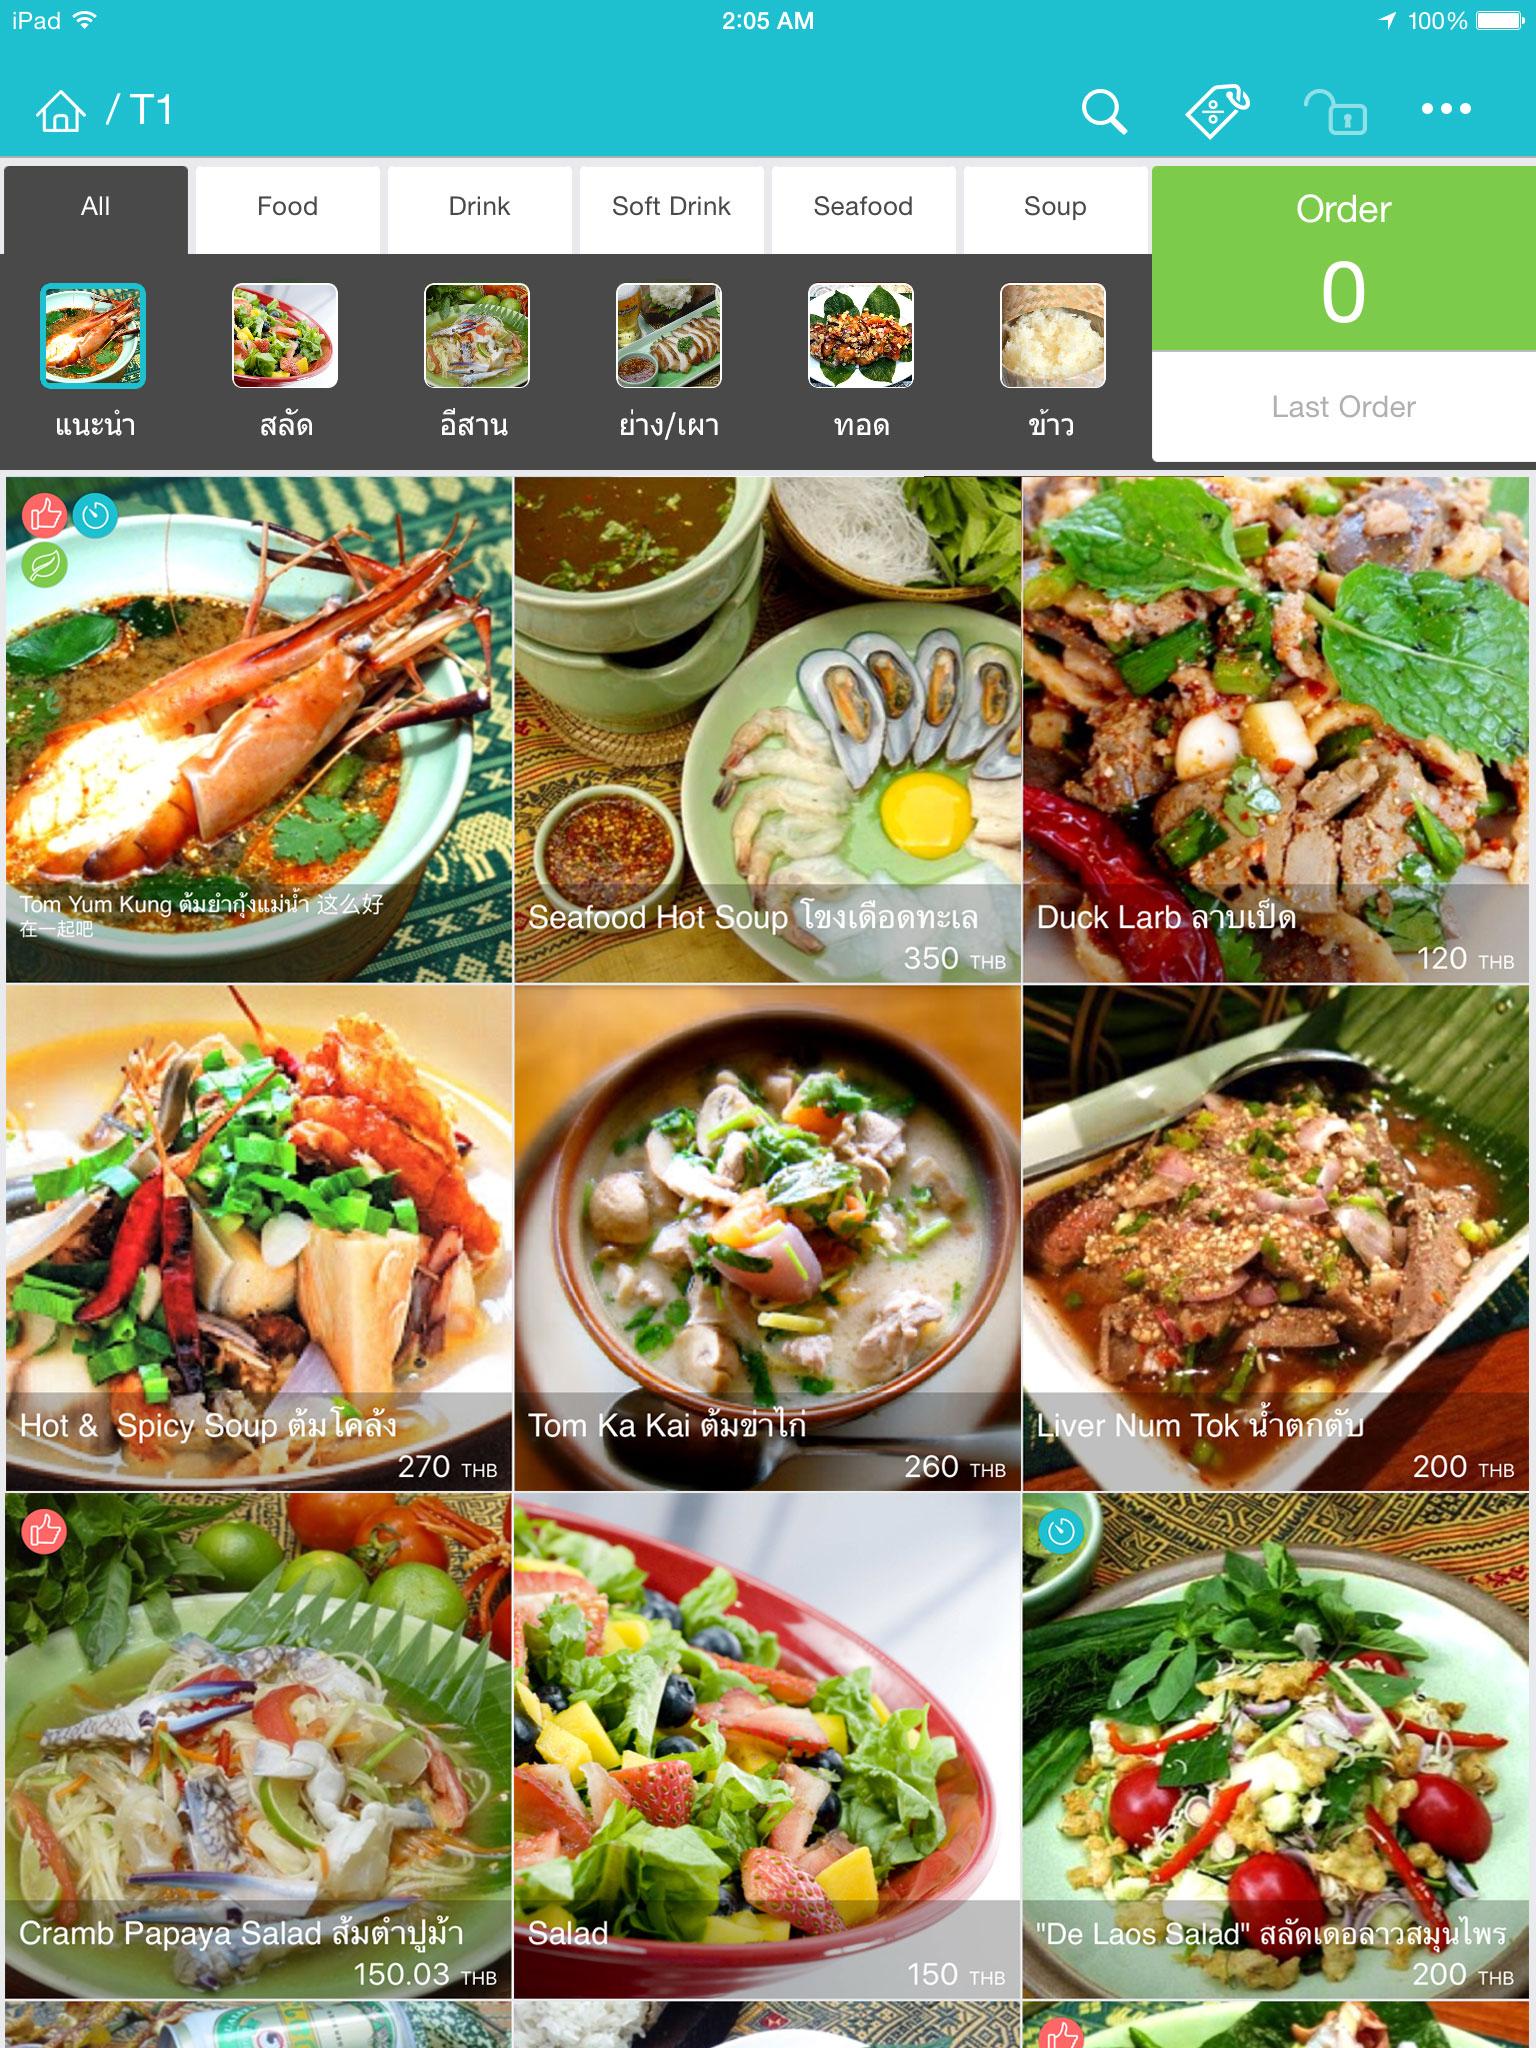 e-Menu - เมนูอาหารบน iPad